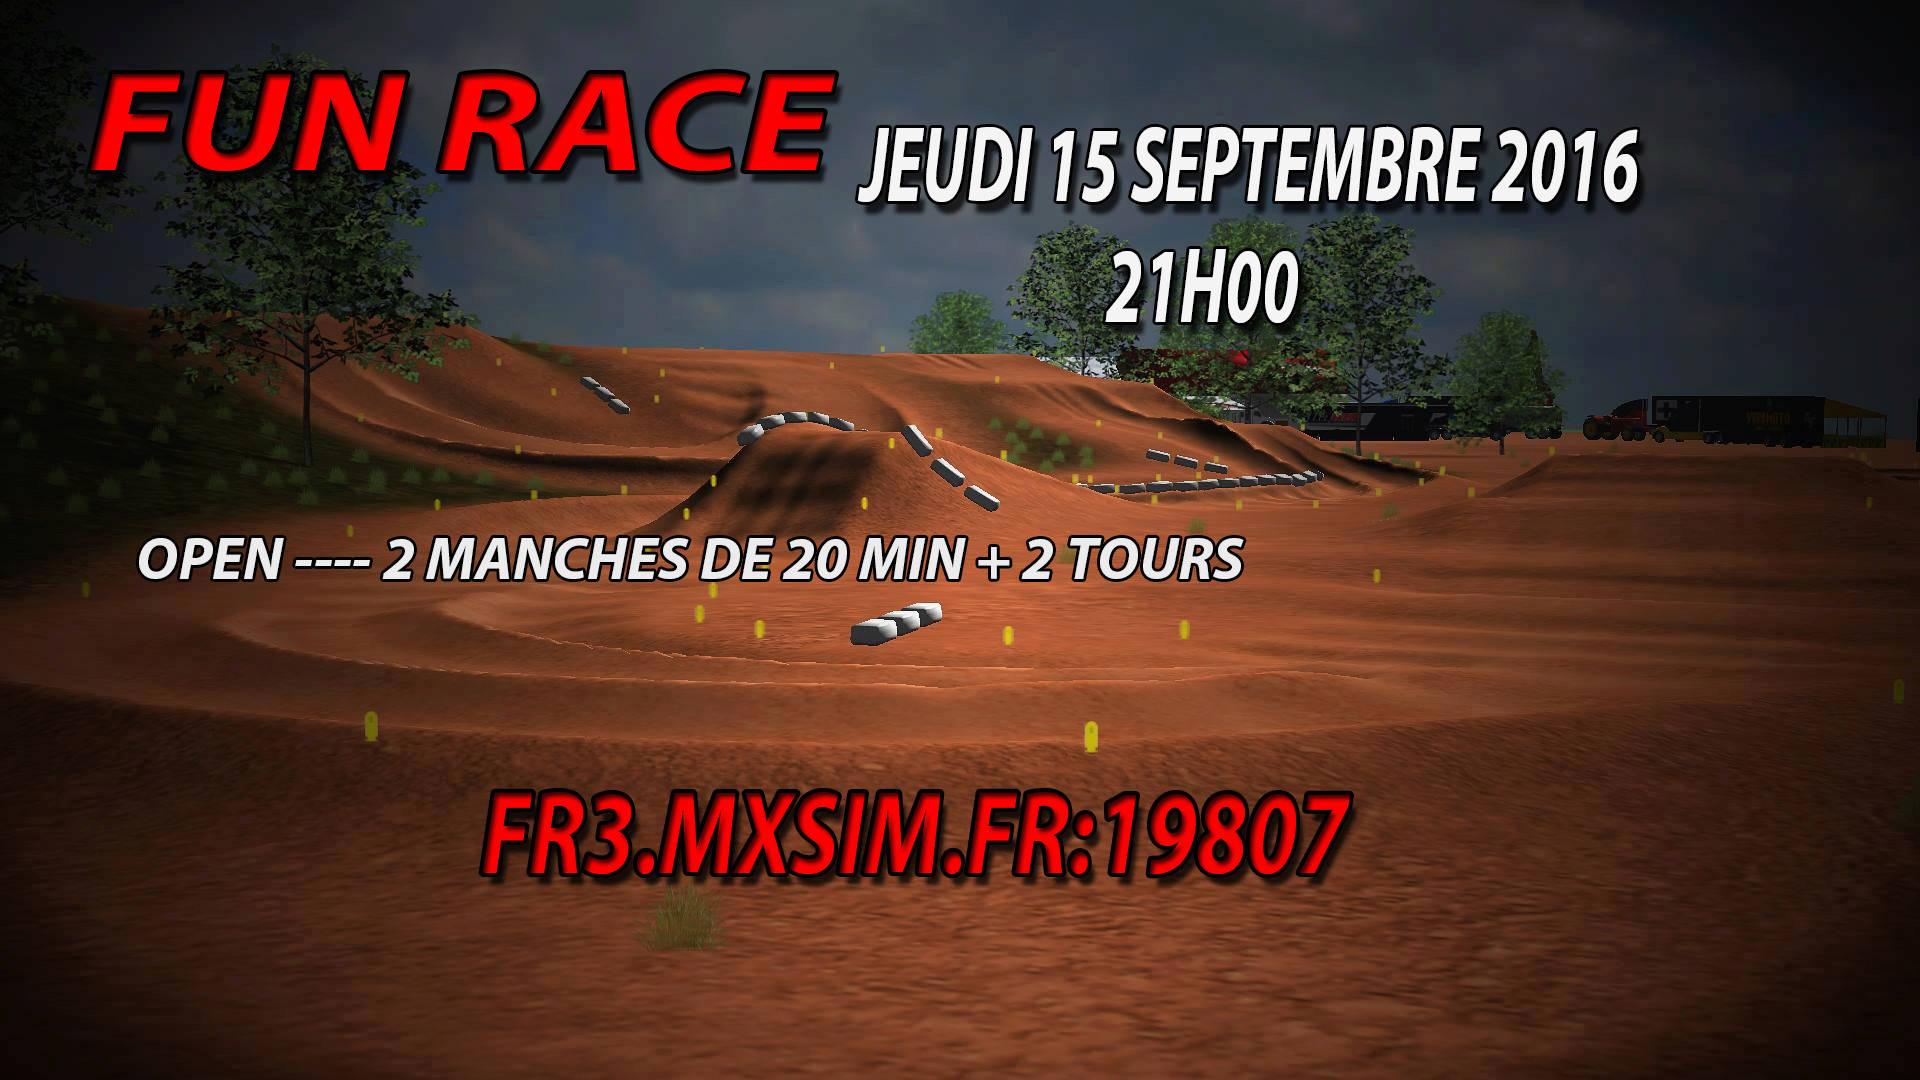 FUN RACE Jeudi 15 Septembre 2016 Sans_t10